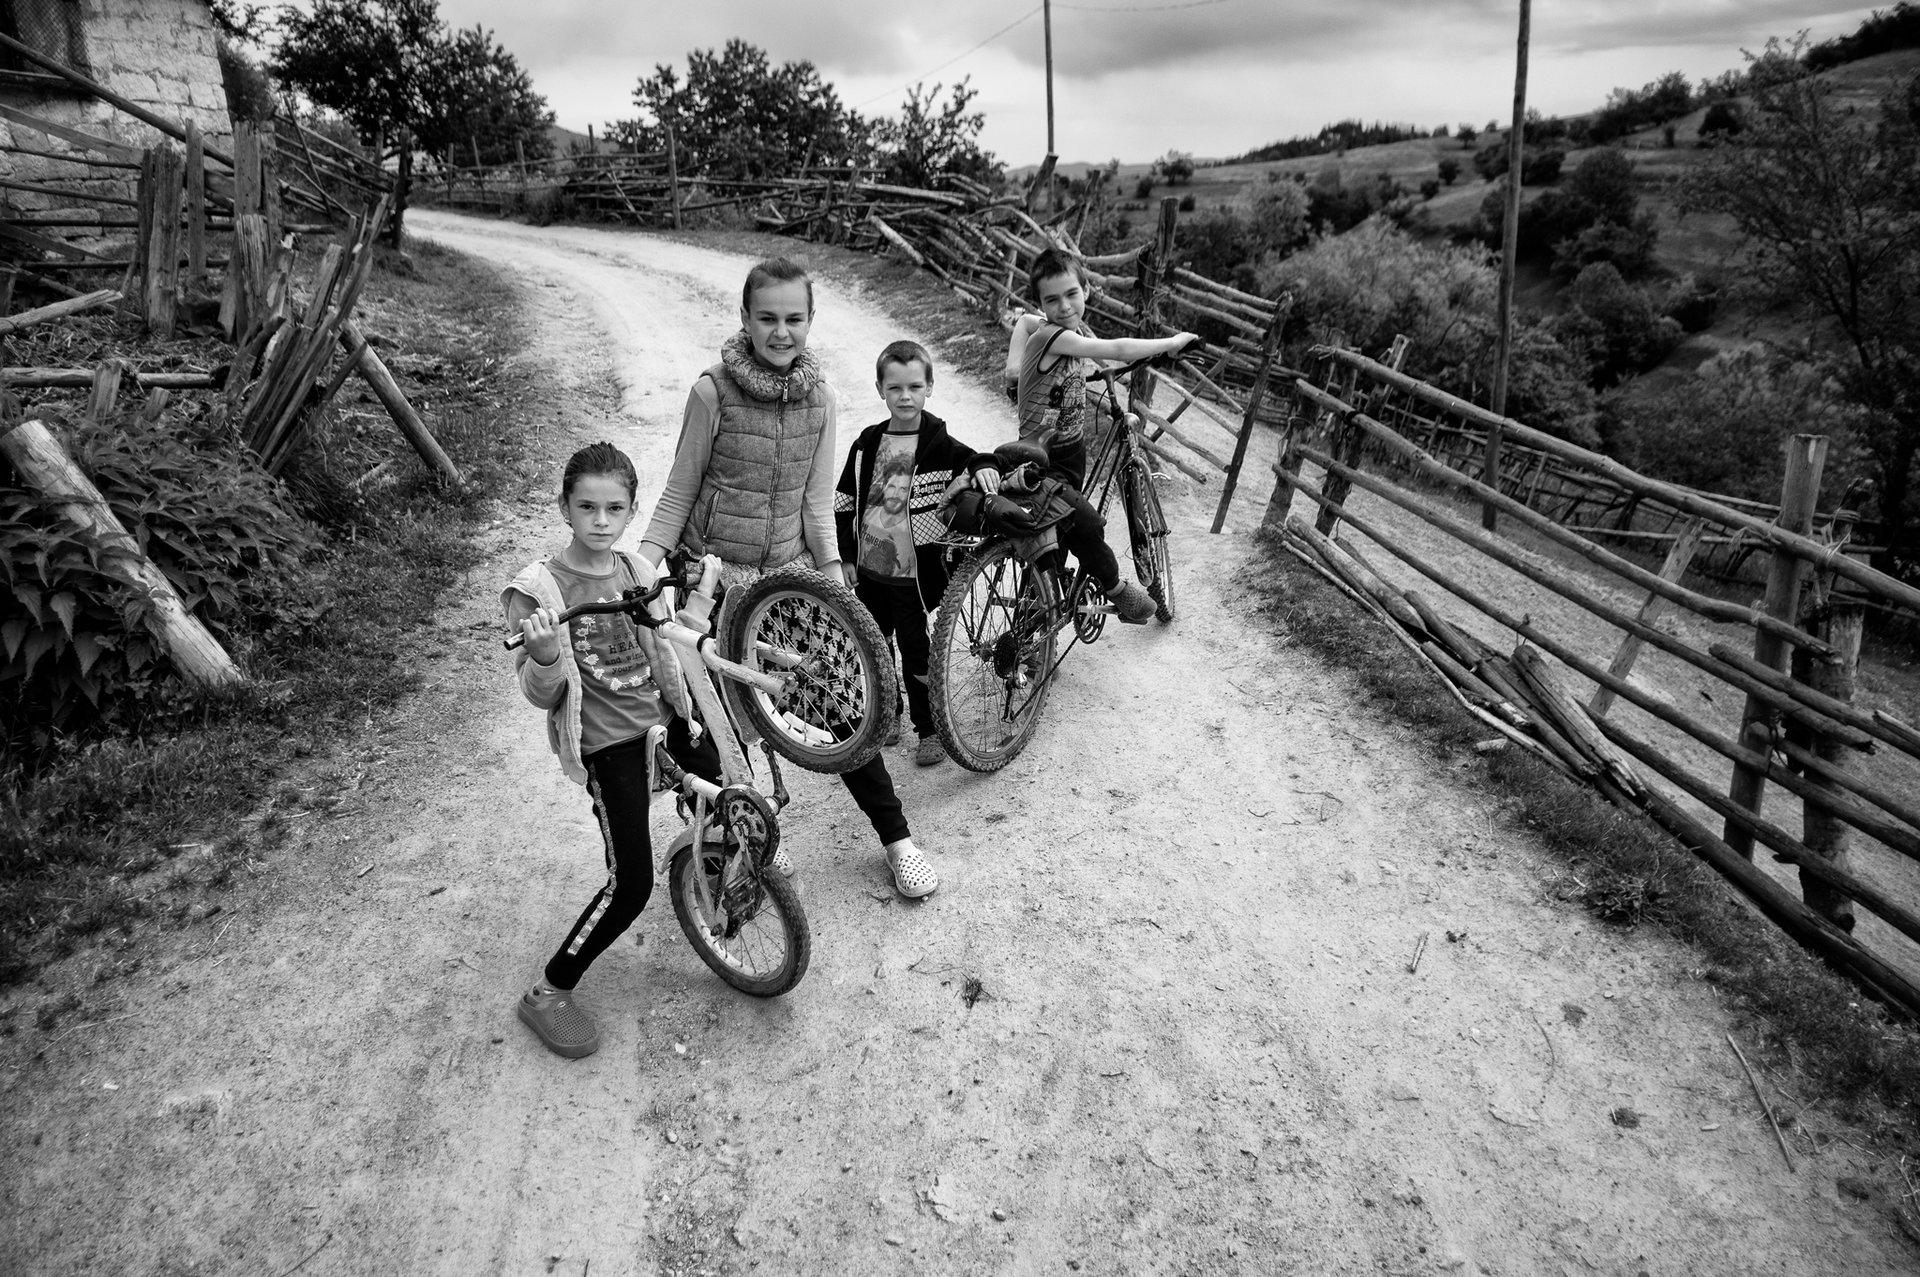 Photo in Daily round | Author Инка | PHOTO FORUM